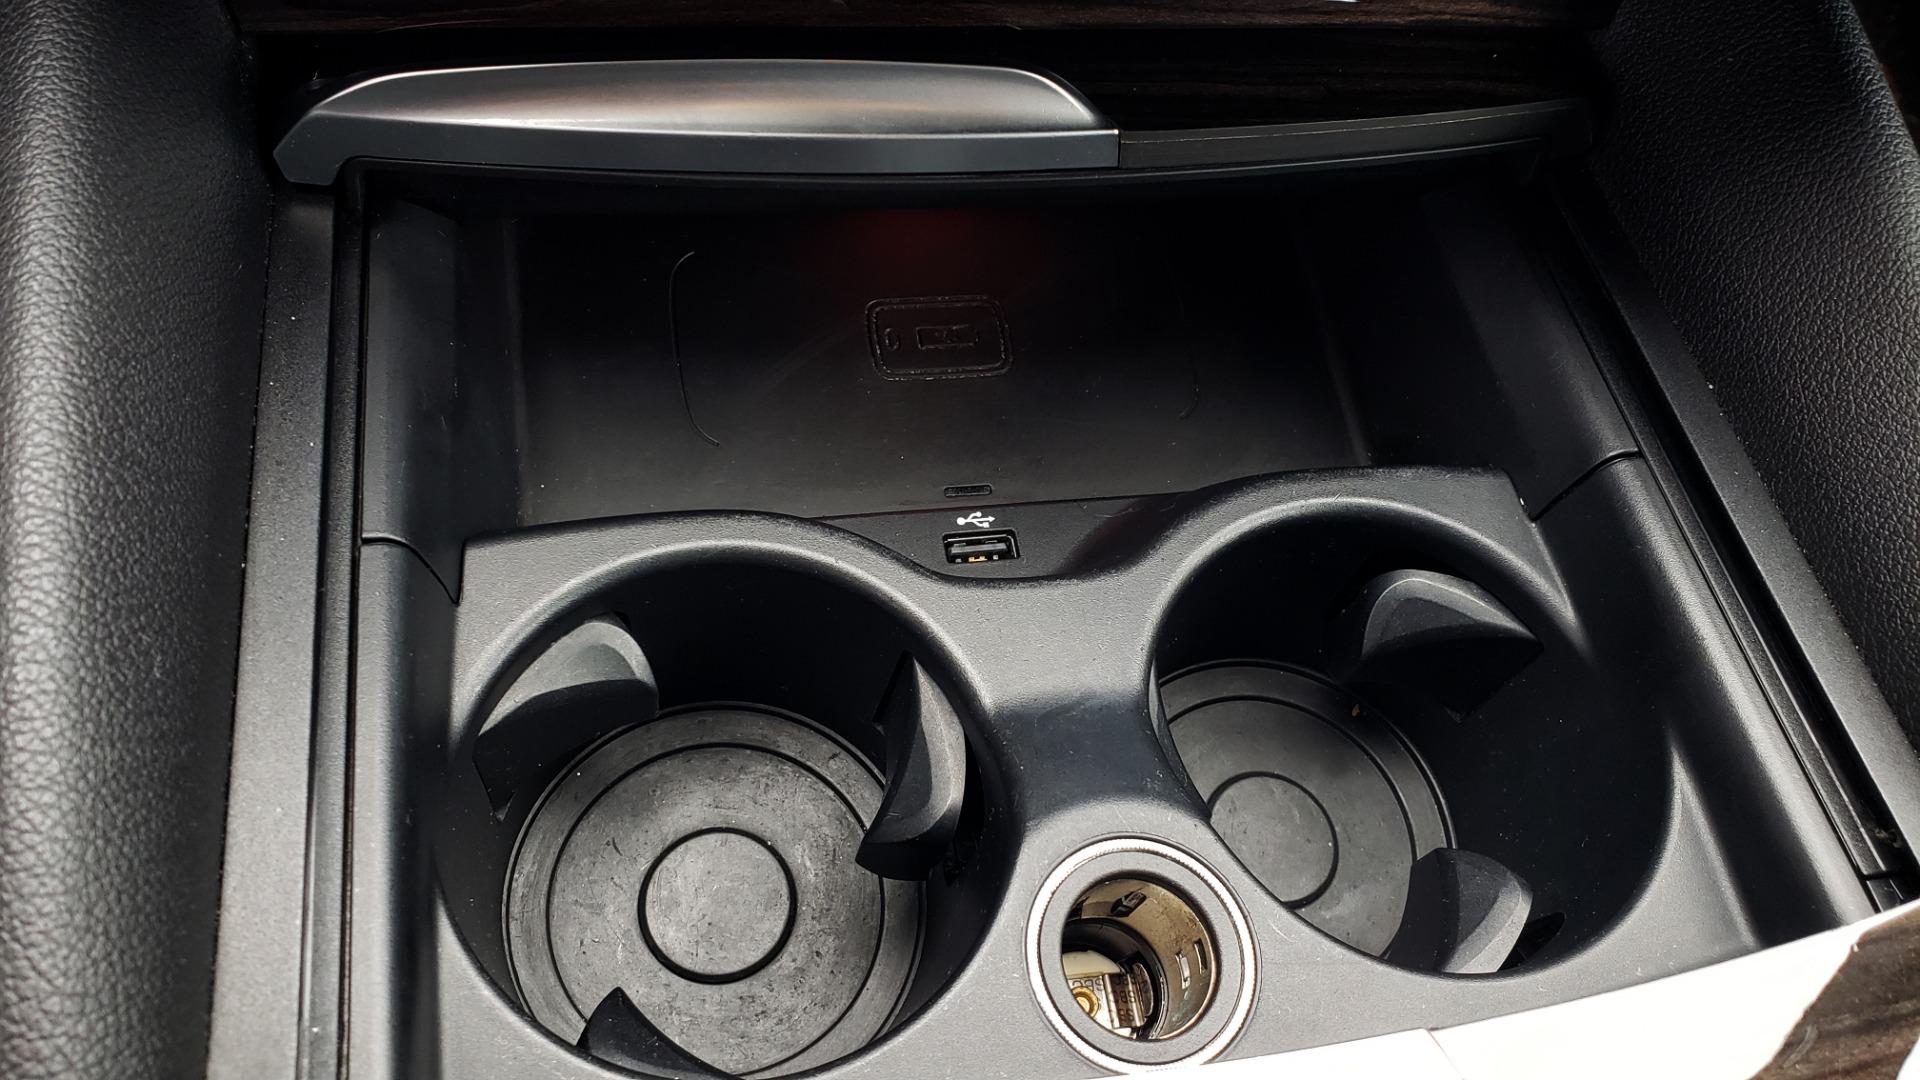 Used 2017 BMW 5 SERIES 530IXDRIVE / PREM PKG / DRVR ASST PLUS / CLD WTHR / APPLE CARPLAY for sale Sold at Formula Imports in Charlotte NC 28227 51